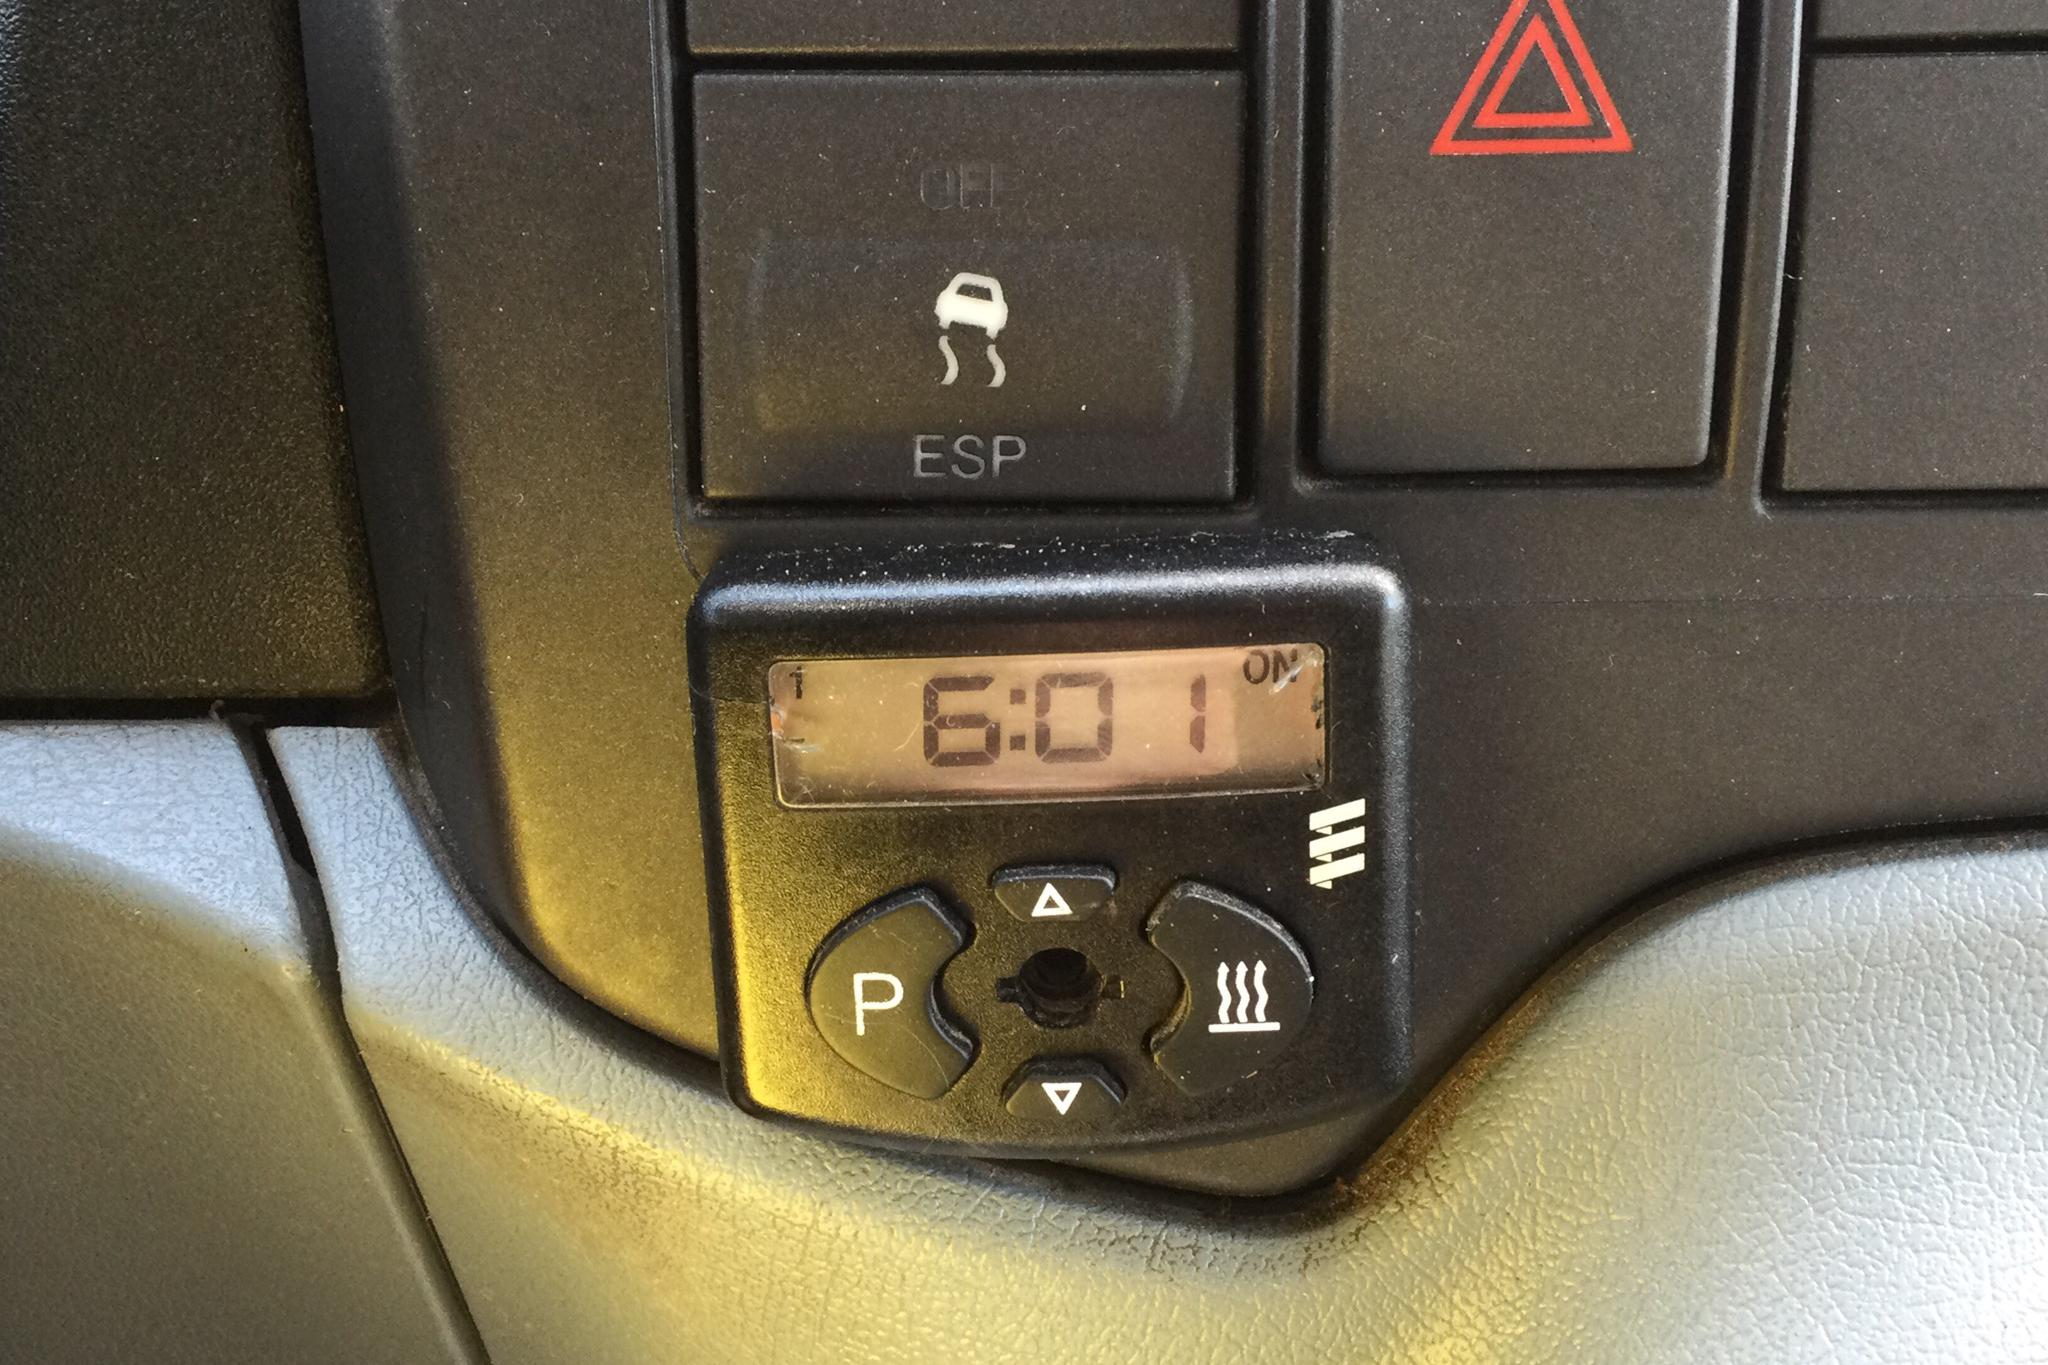 Ford Transit 350 2.2 TDCi Pickup (140hk) - 180 940 km - Manual - gray - 2012